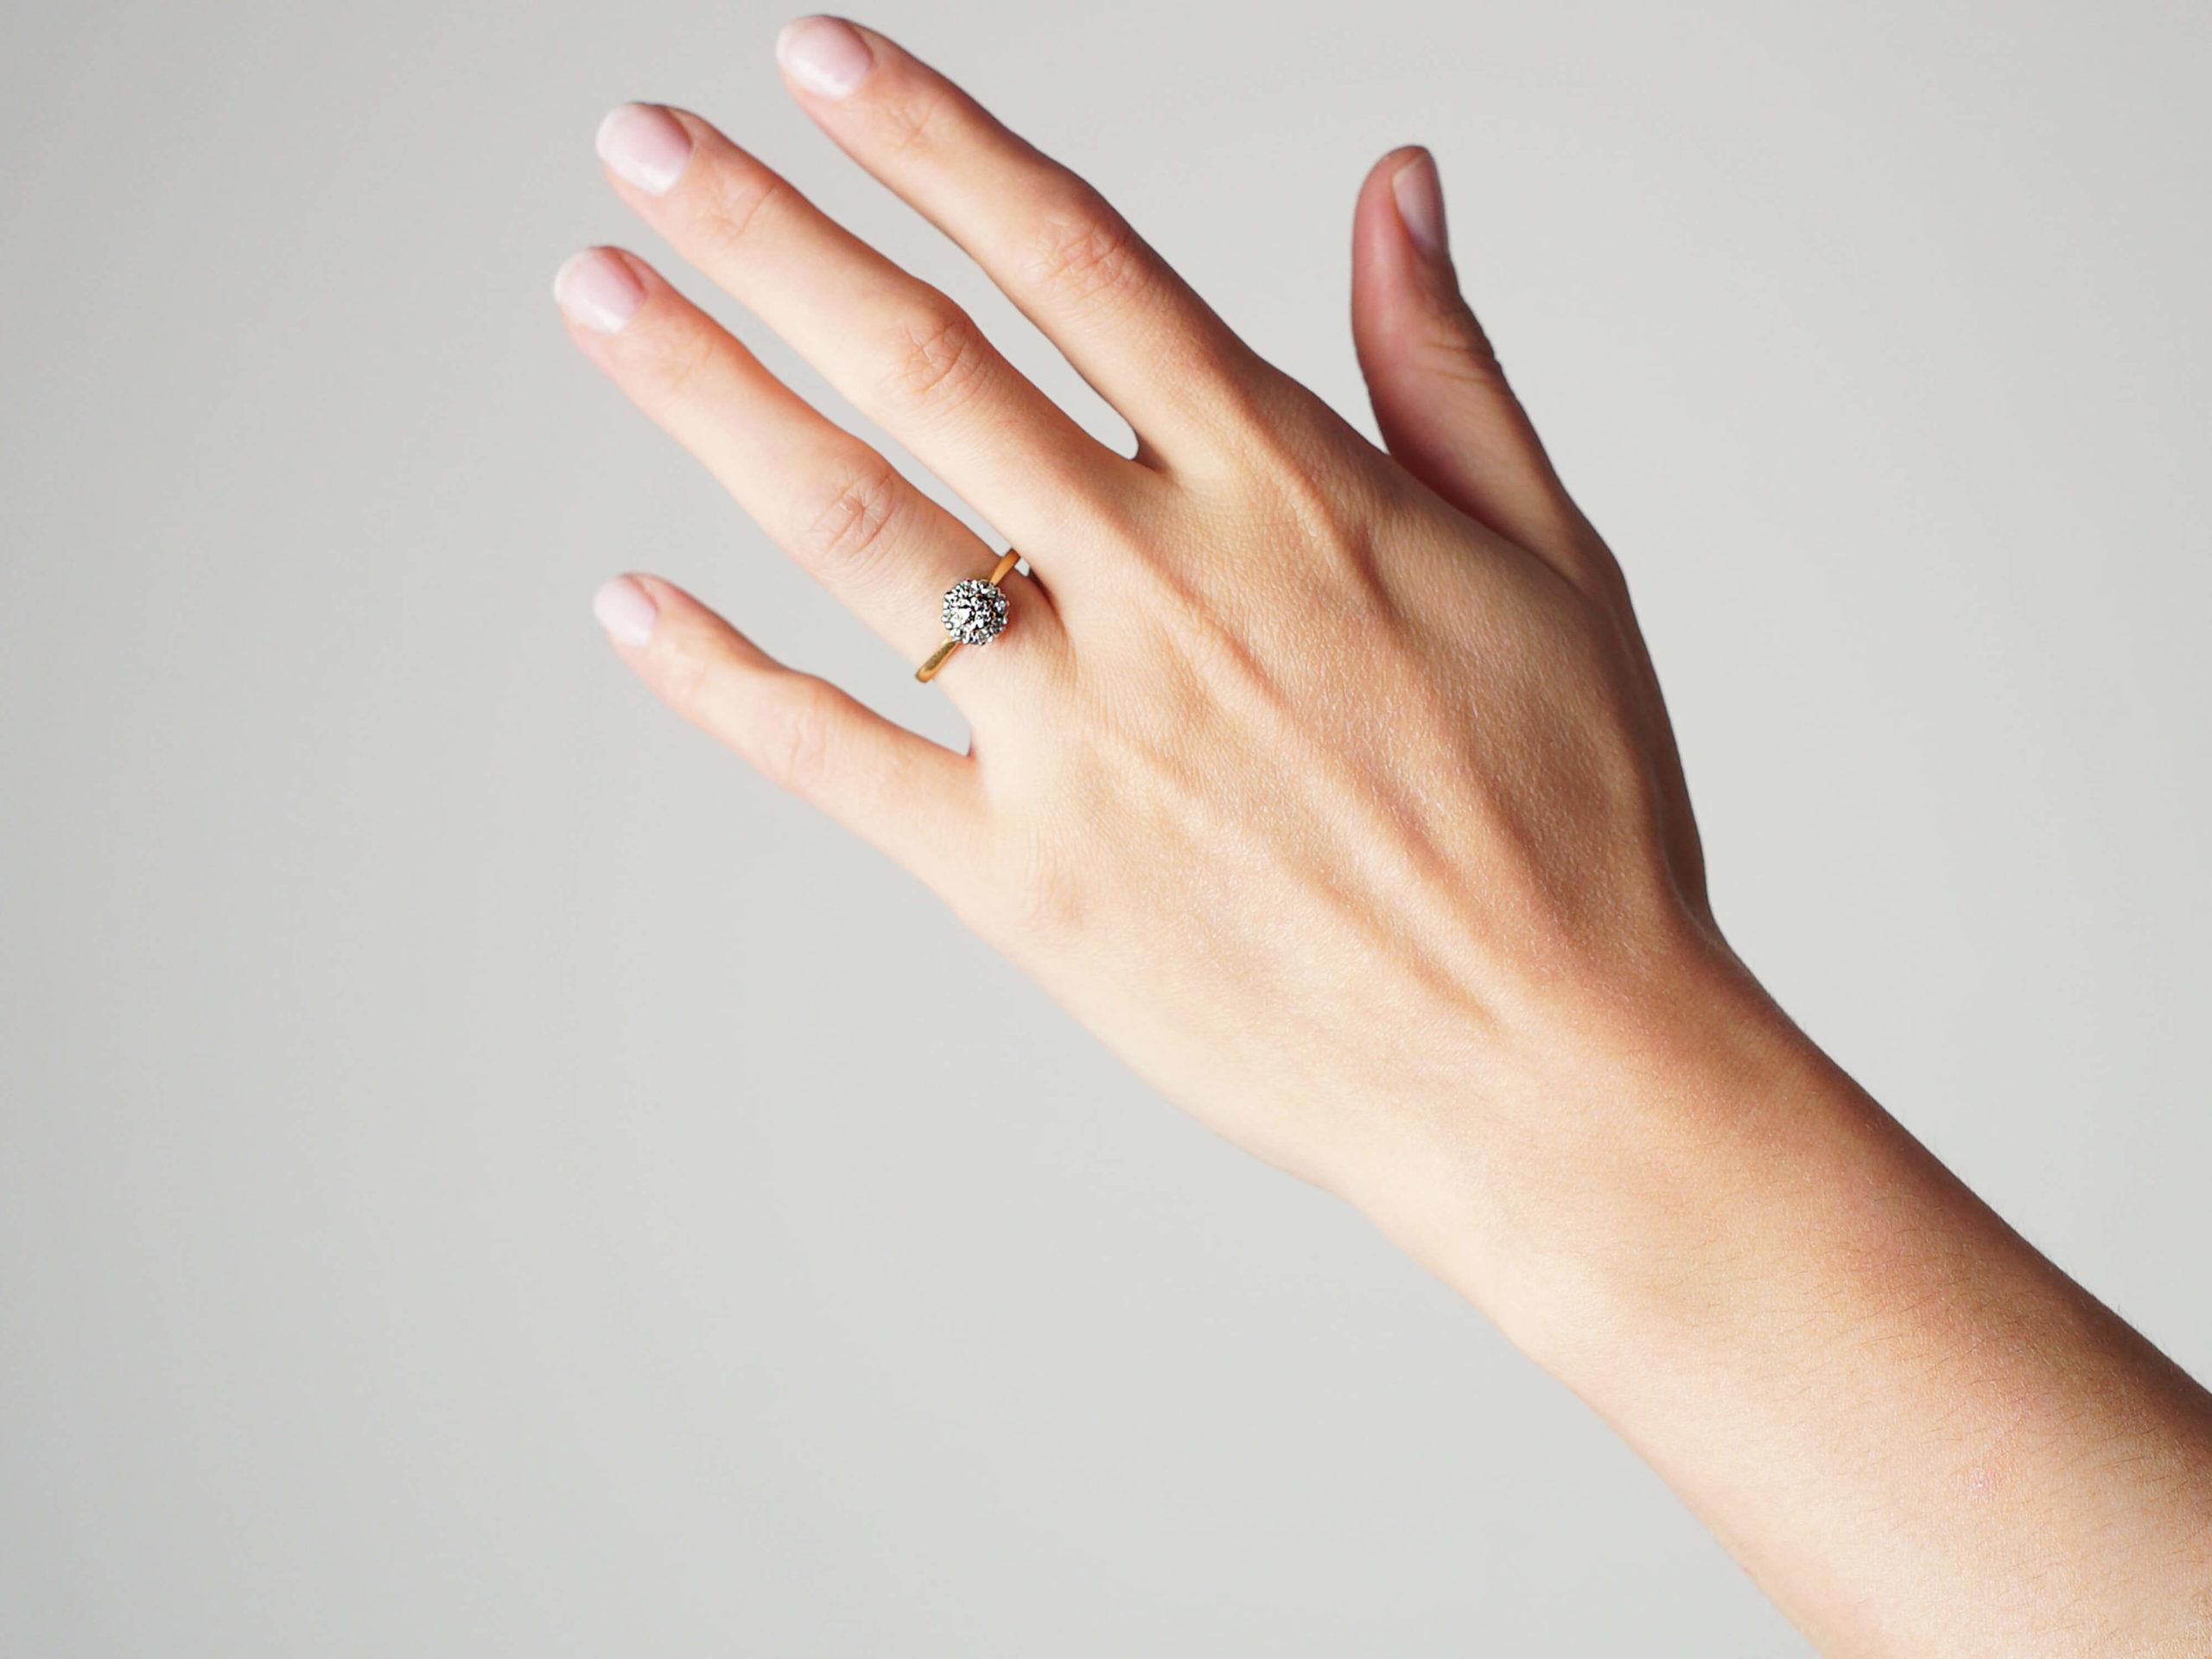 18ct White & Yellow Gold, Diamond Cluster Ring